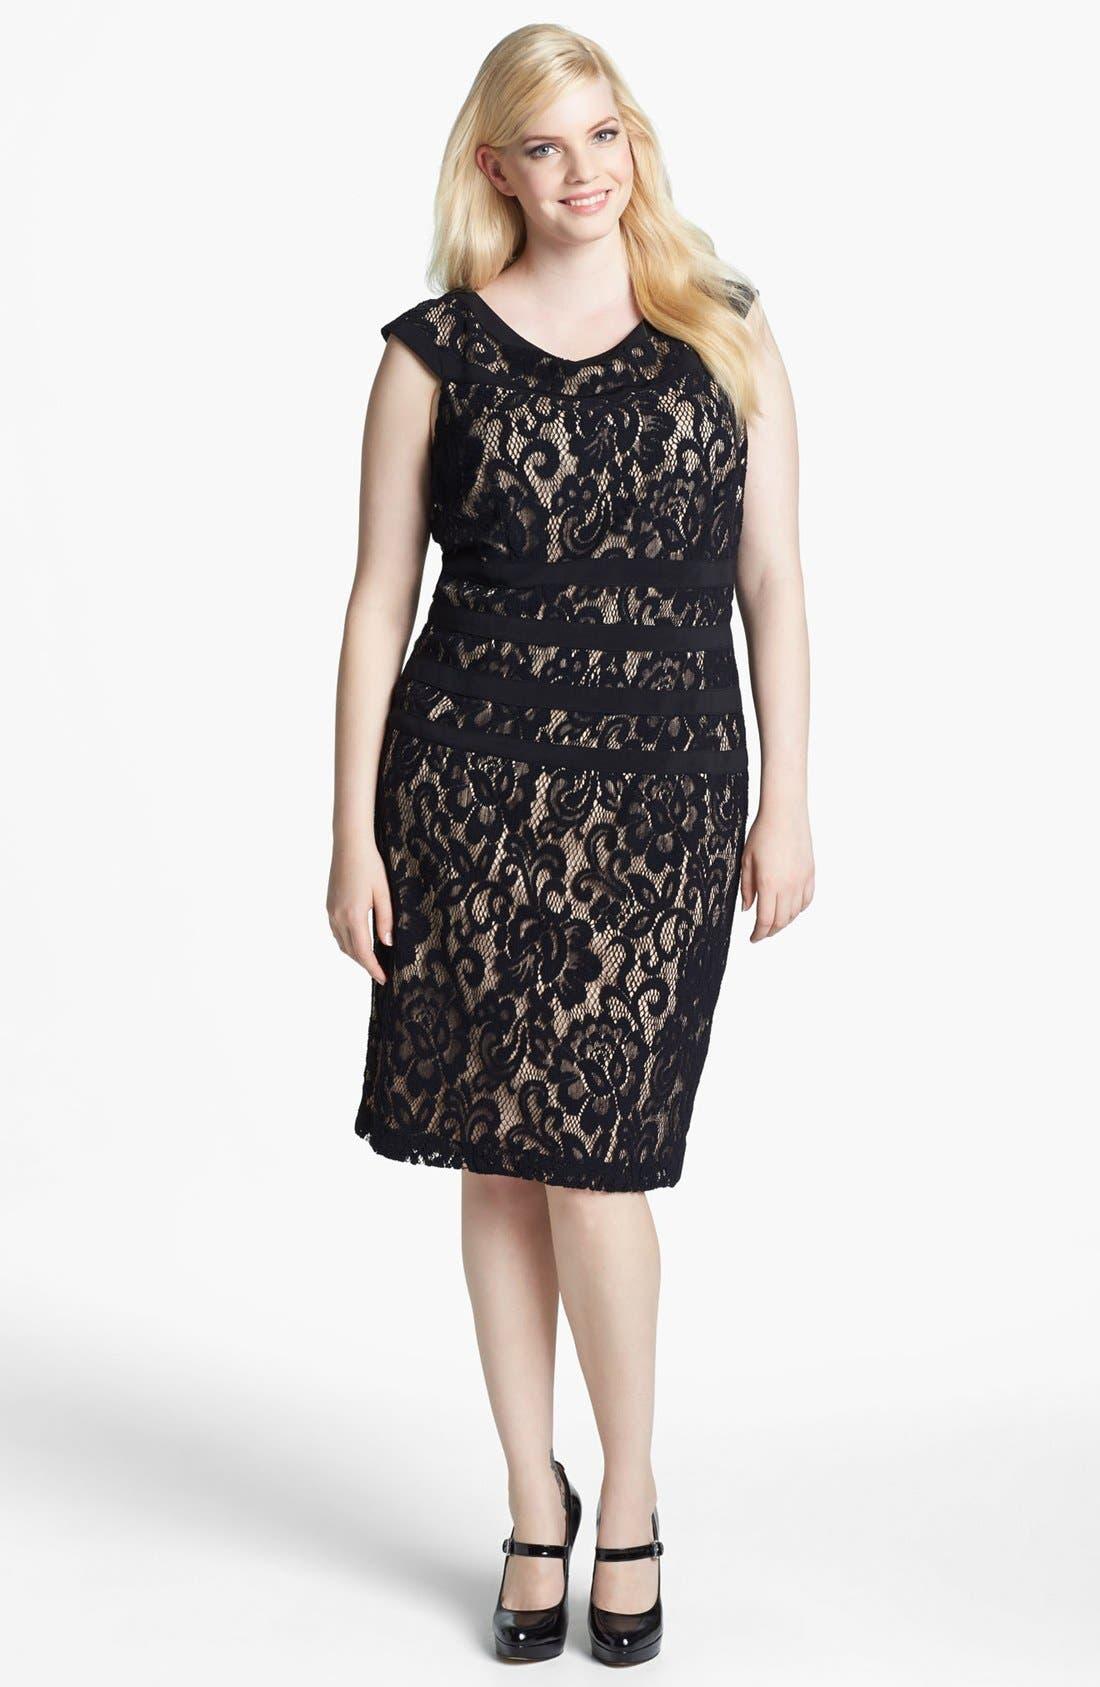 Alternate Image 1 Selected - Xscape Lace Sheath Dress (Plus Size)